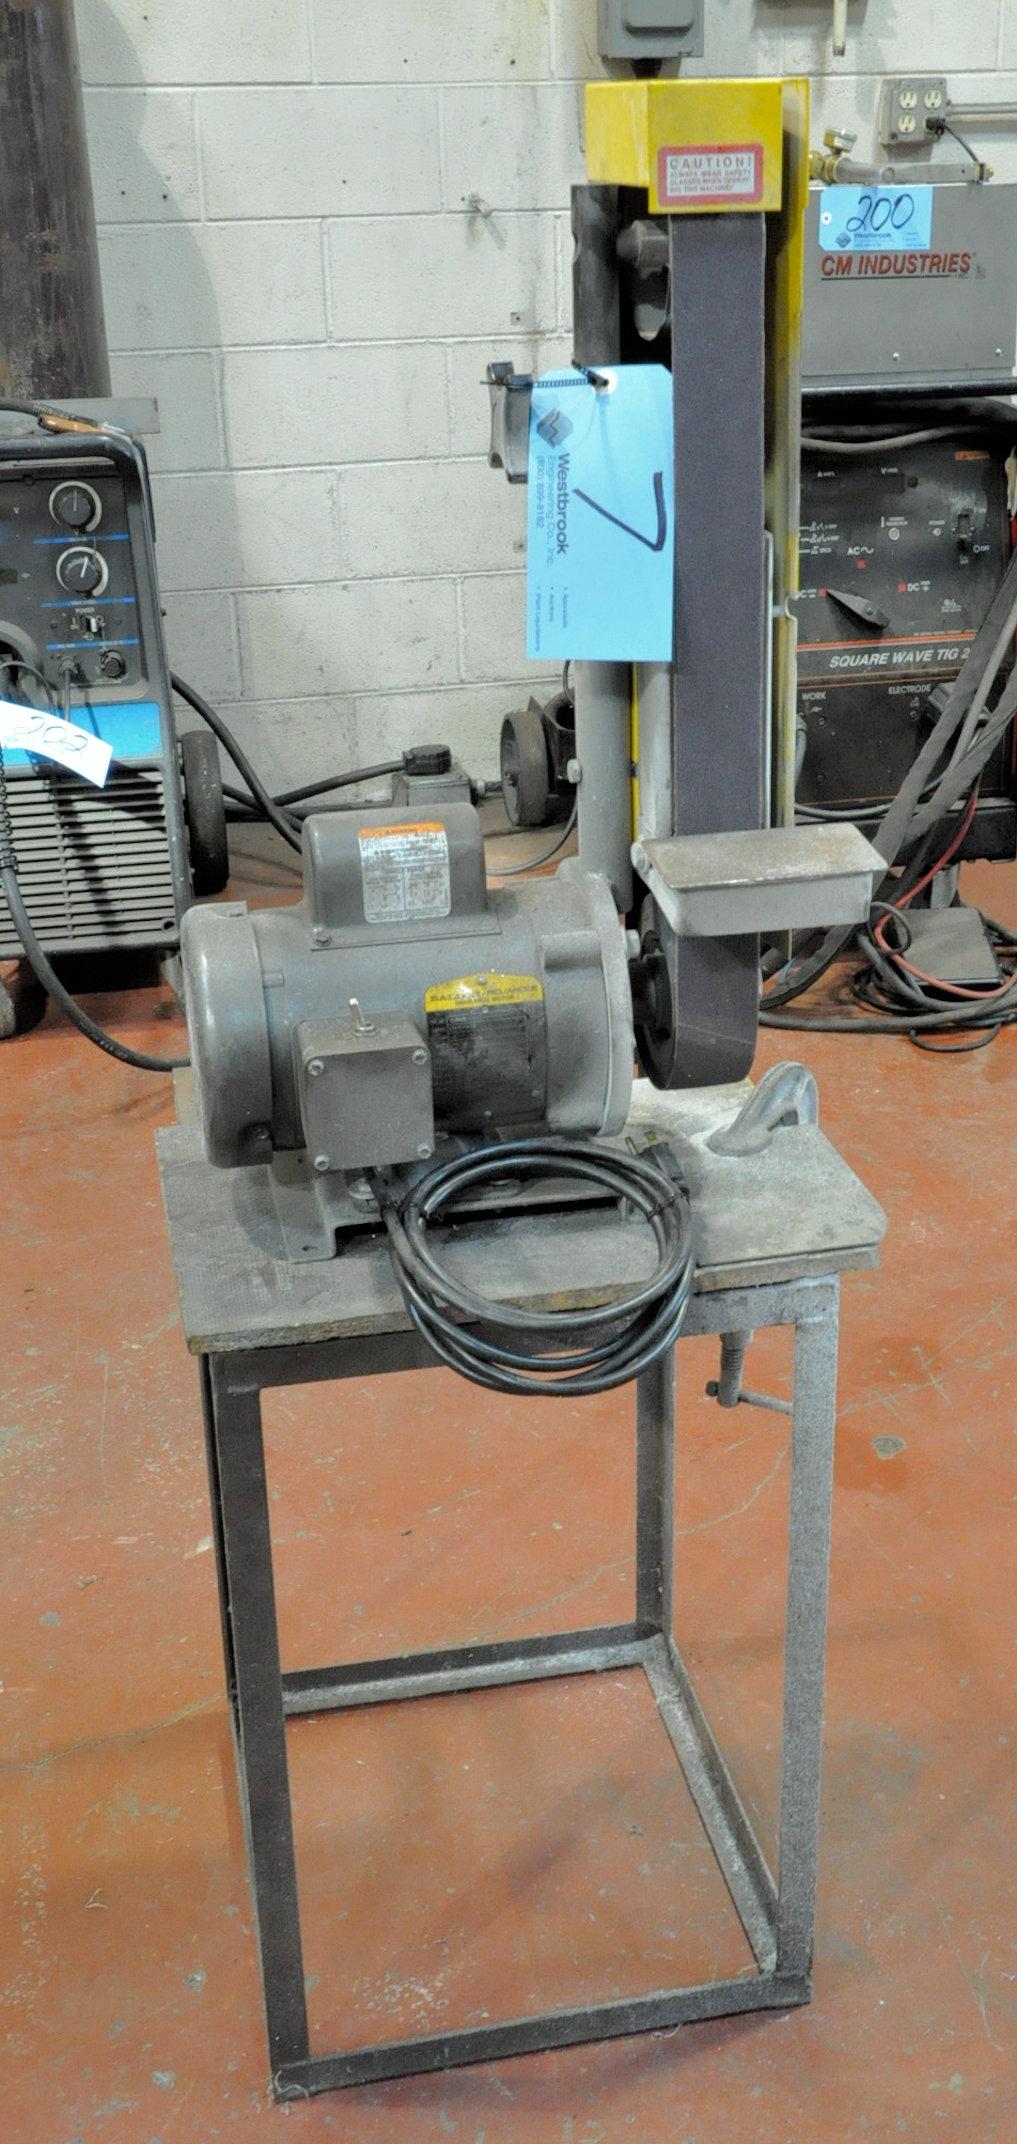 "Kalamazoo 2"" Vertical Belt Sander, Baldor 1/2-HP Motor, with Stand"